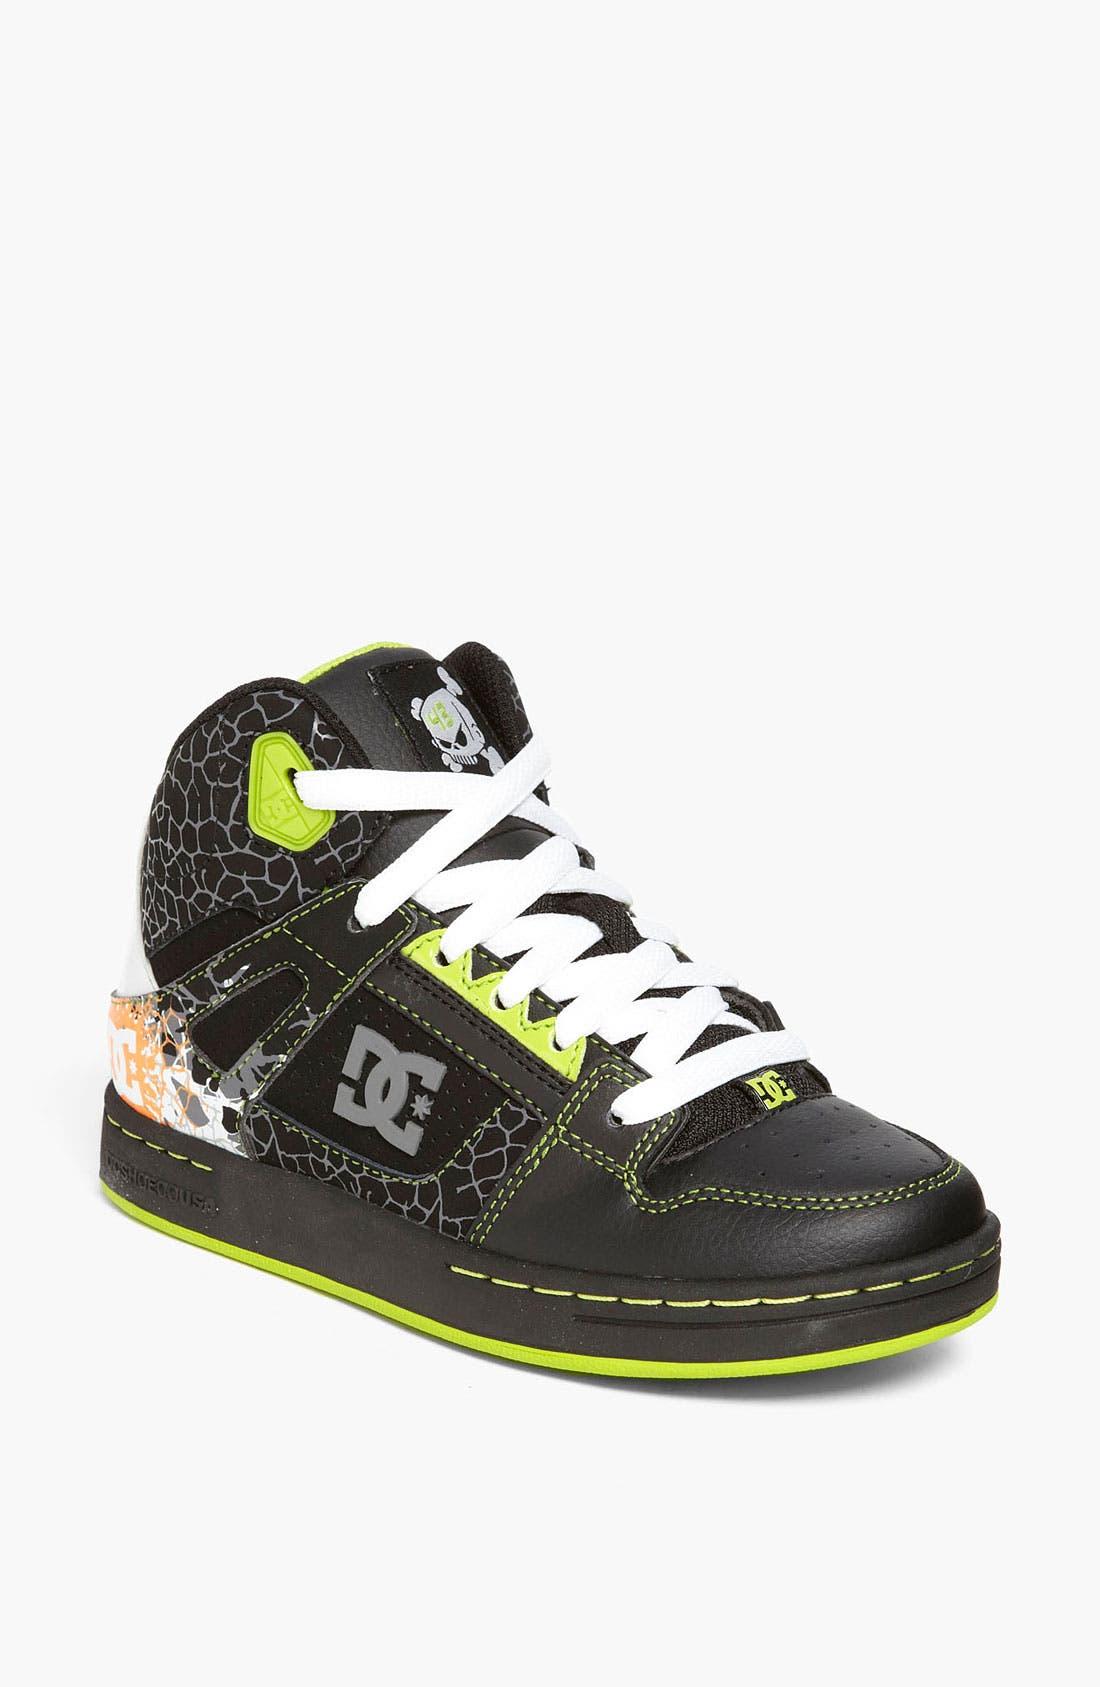 Alternate Image 1 Selected - DC Shoes 'Rebound' Sneaker (Toddler, Little Kid & Big Kid)